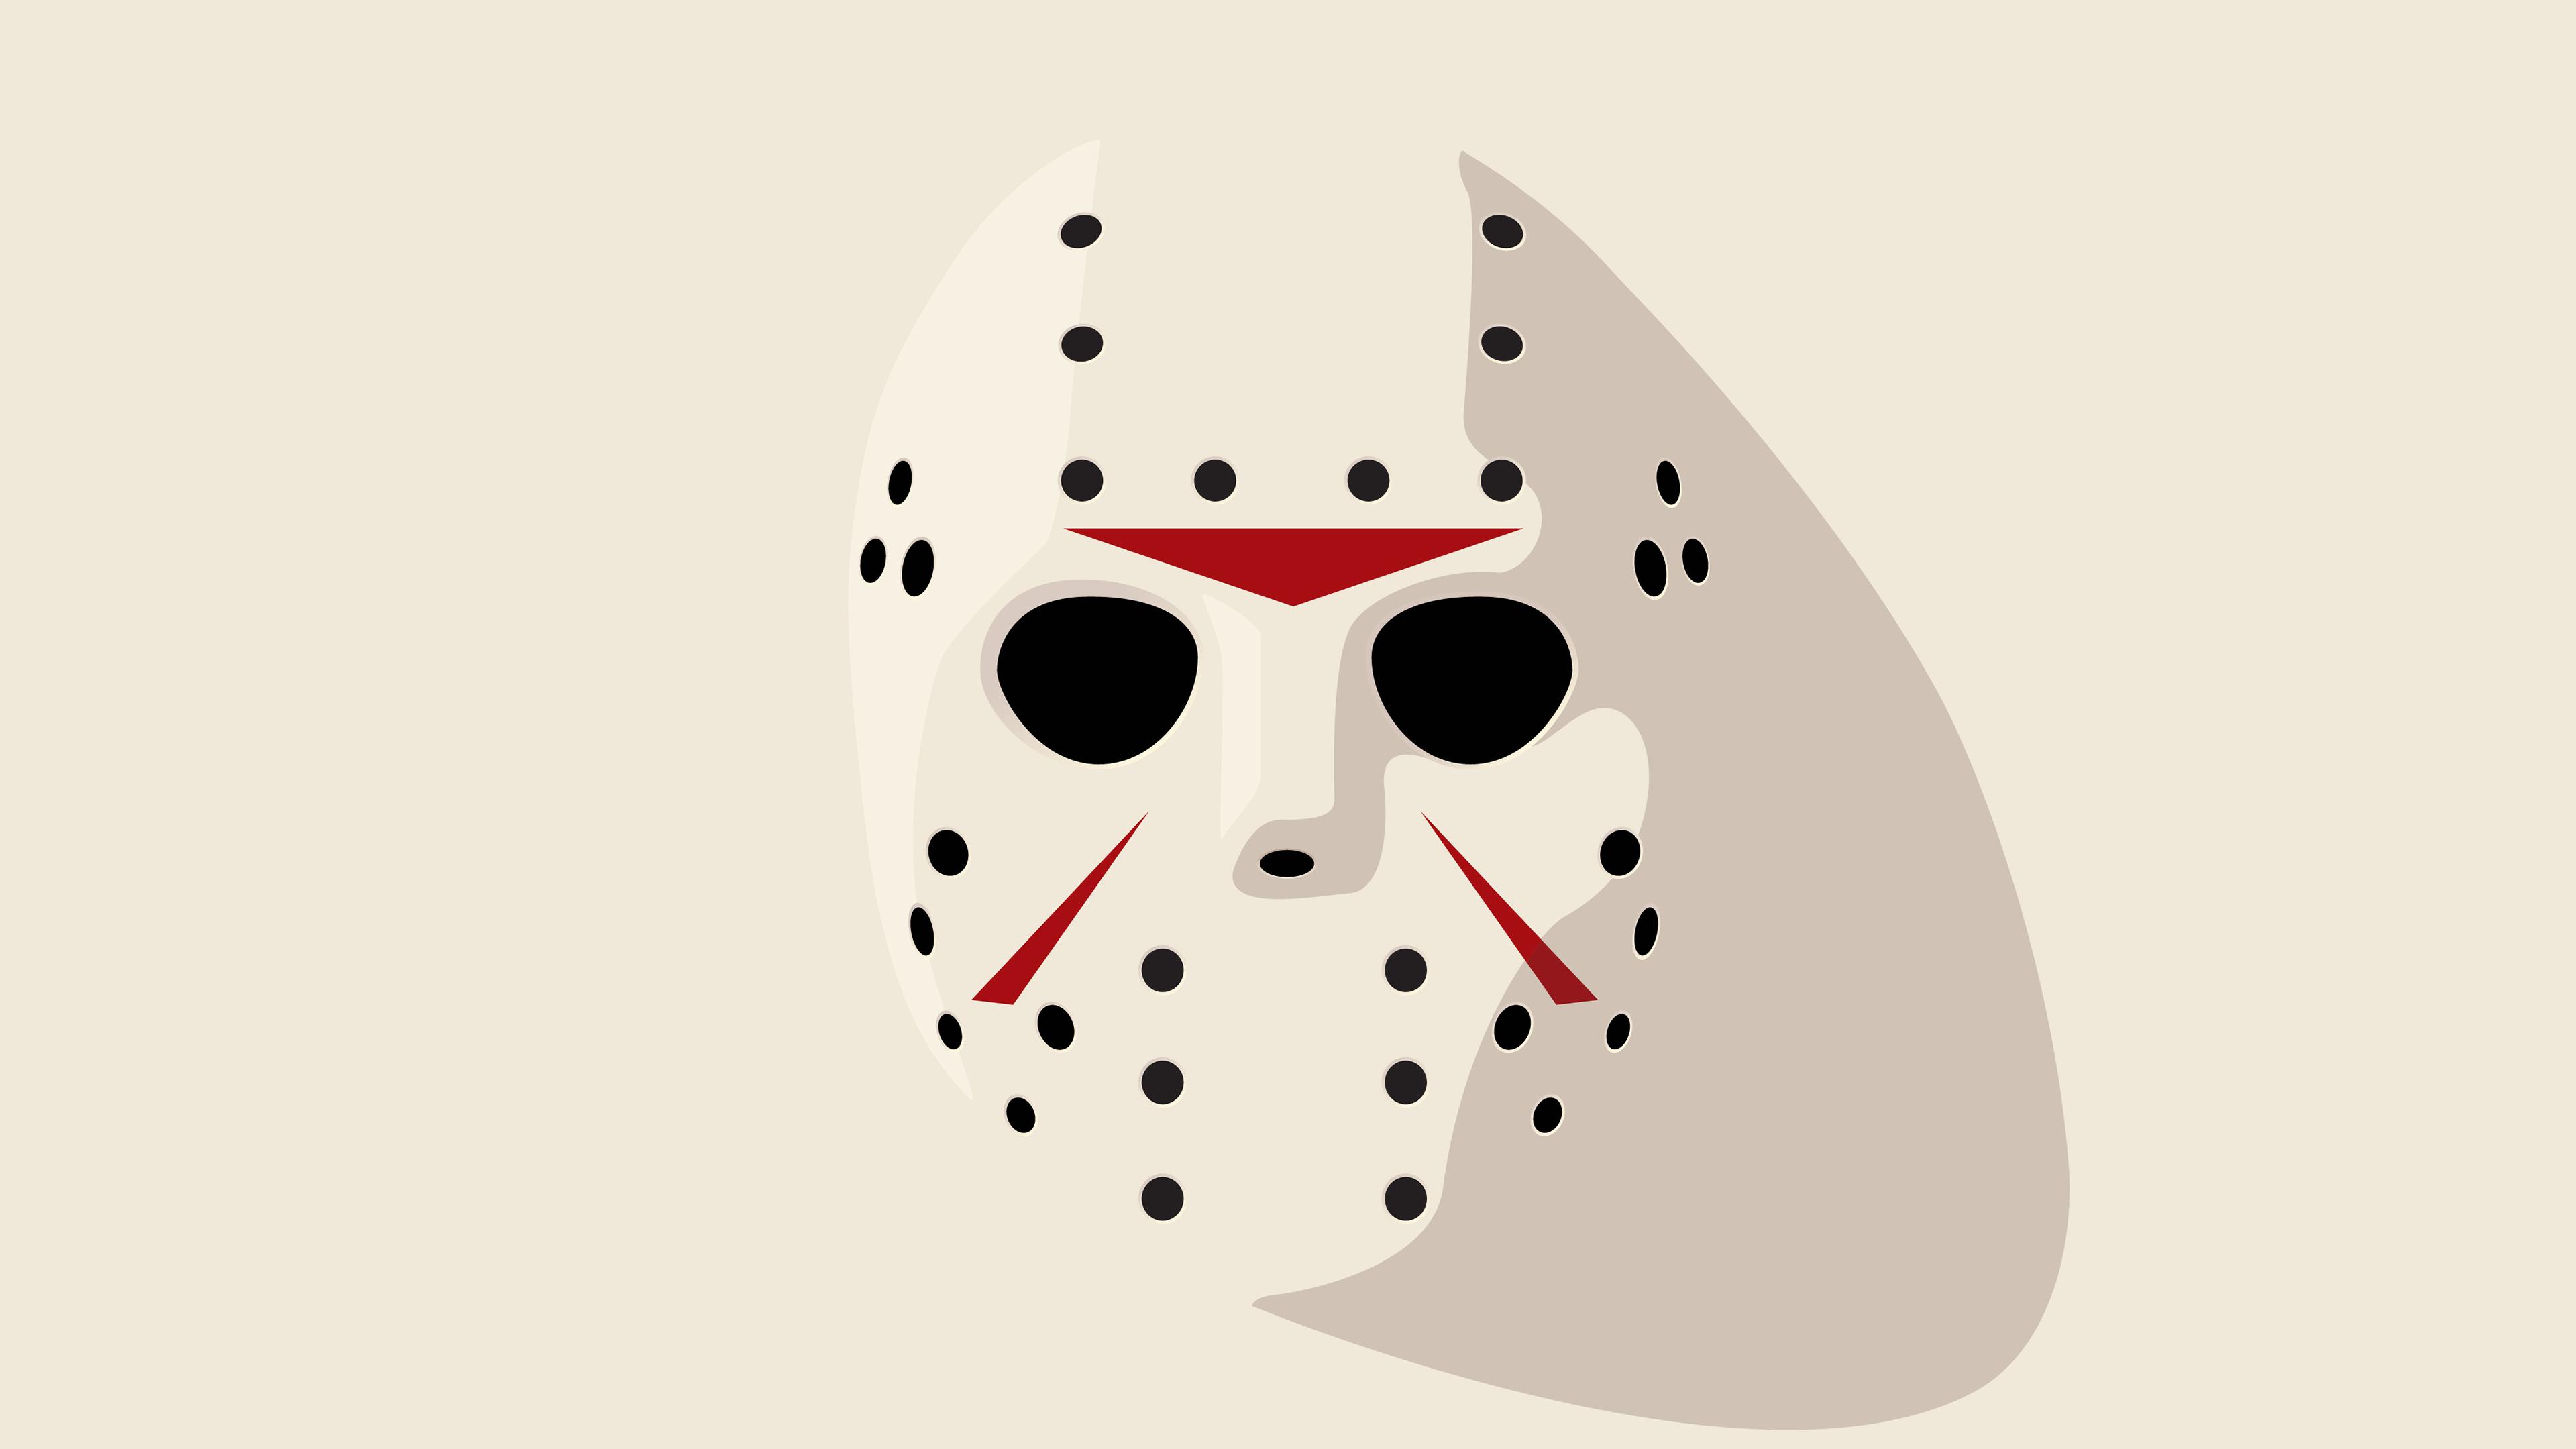 3840x2160 Jason Friday 13th Hockey Mask 4k Wallpaper Hd Vector